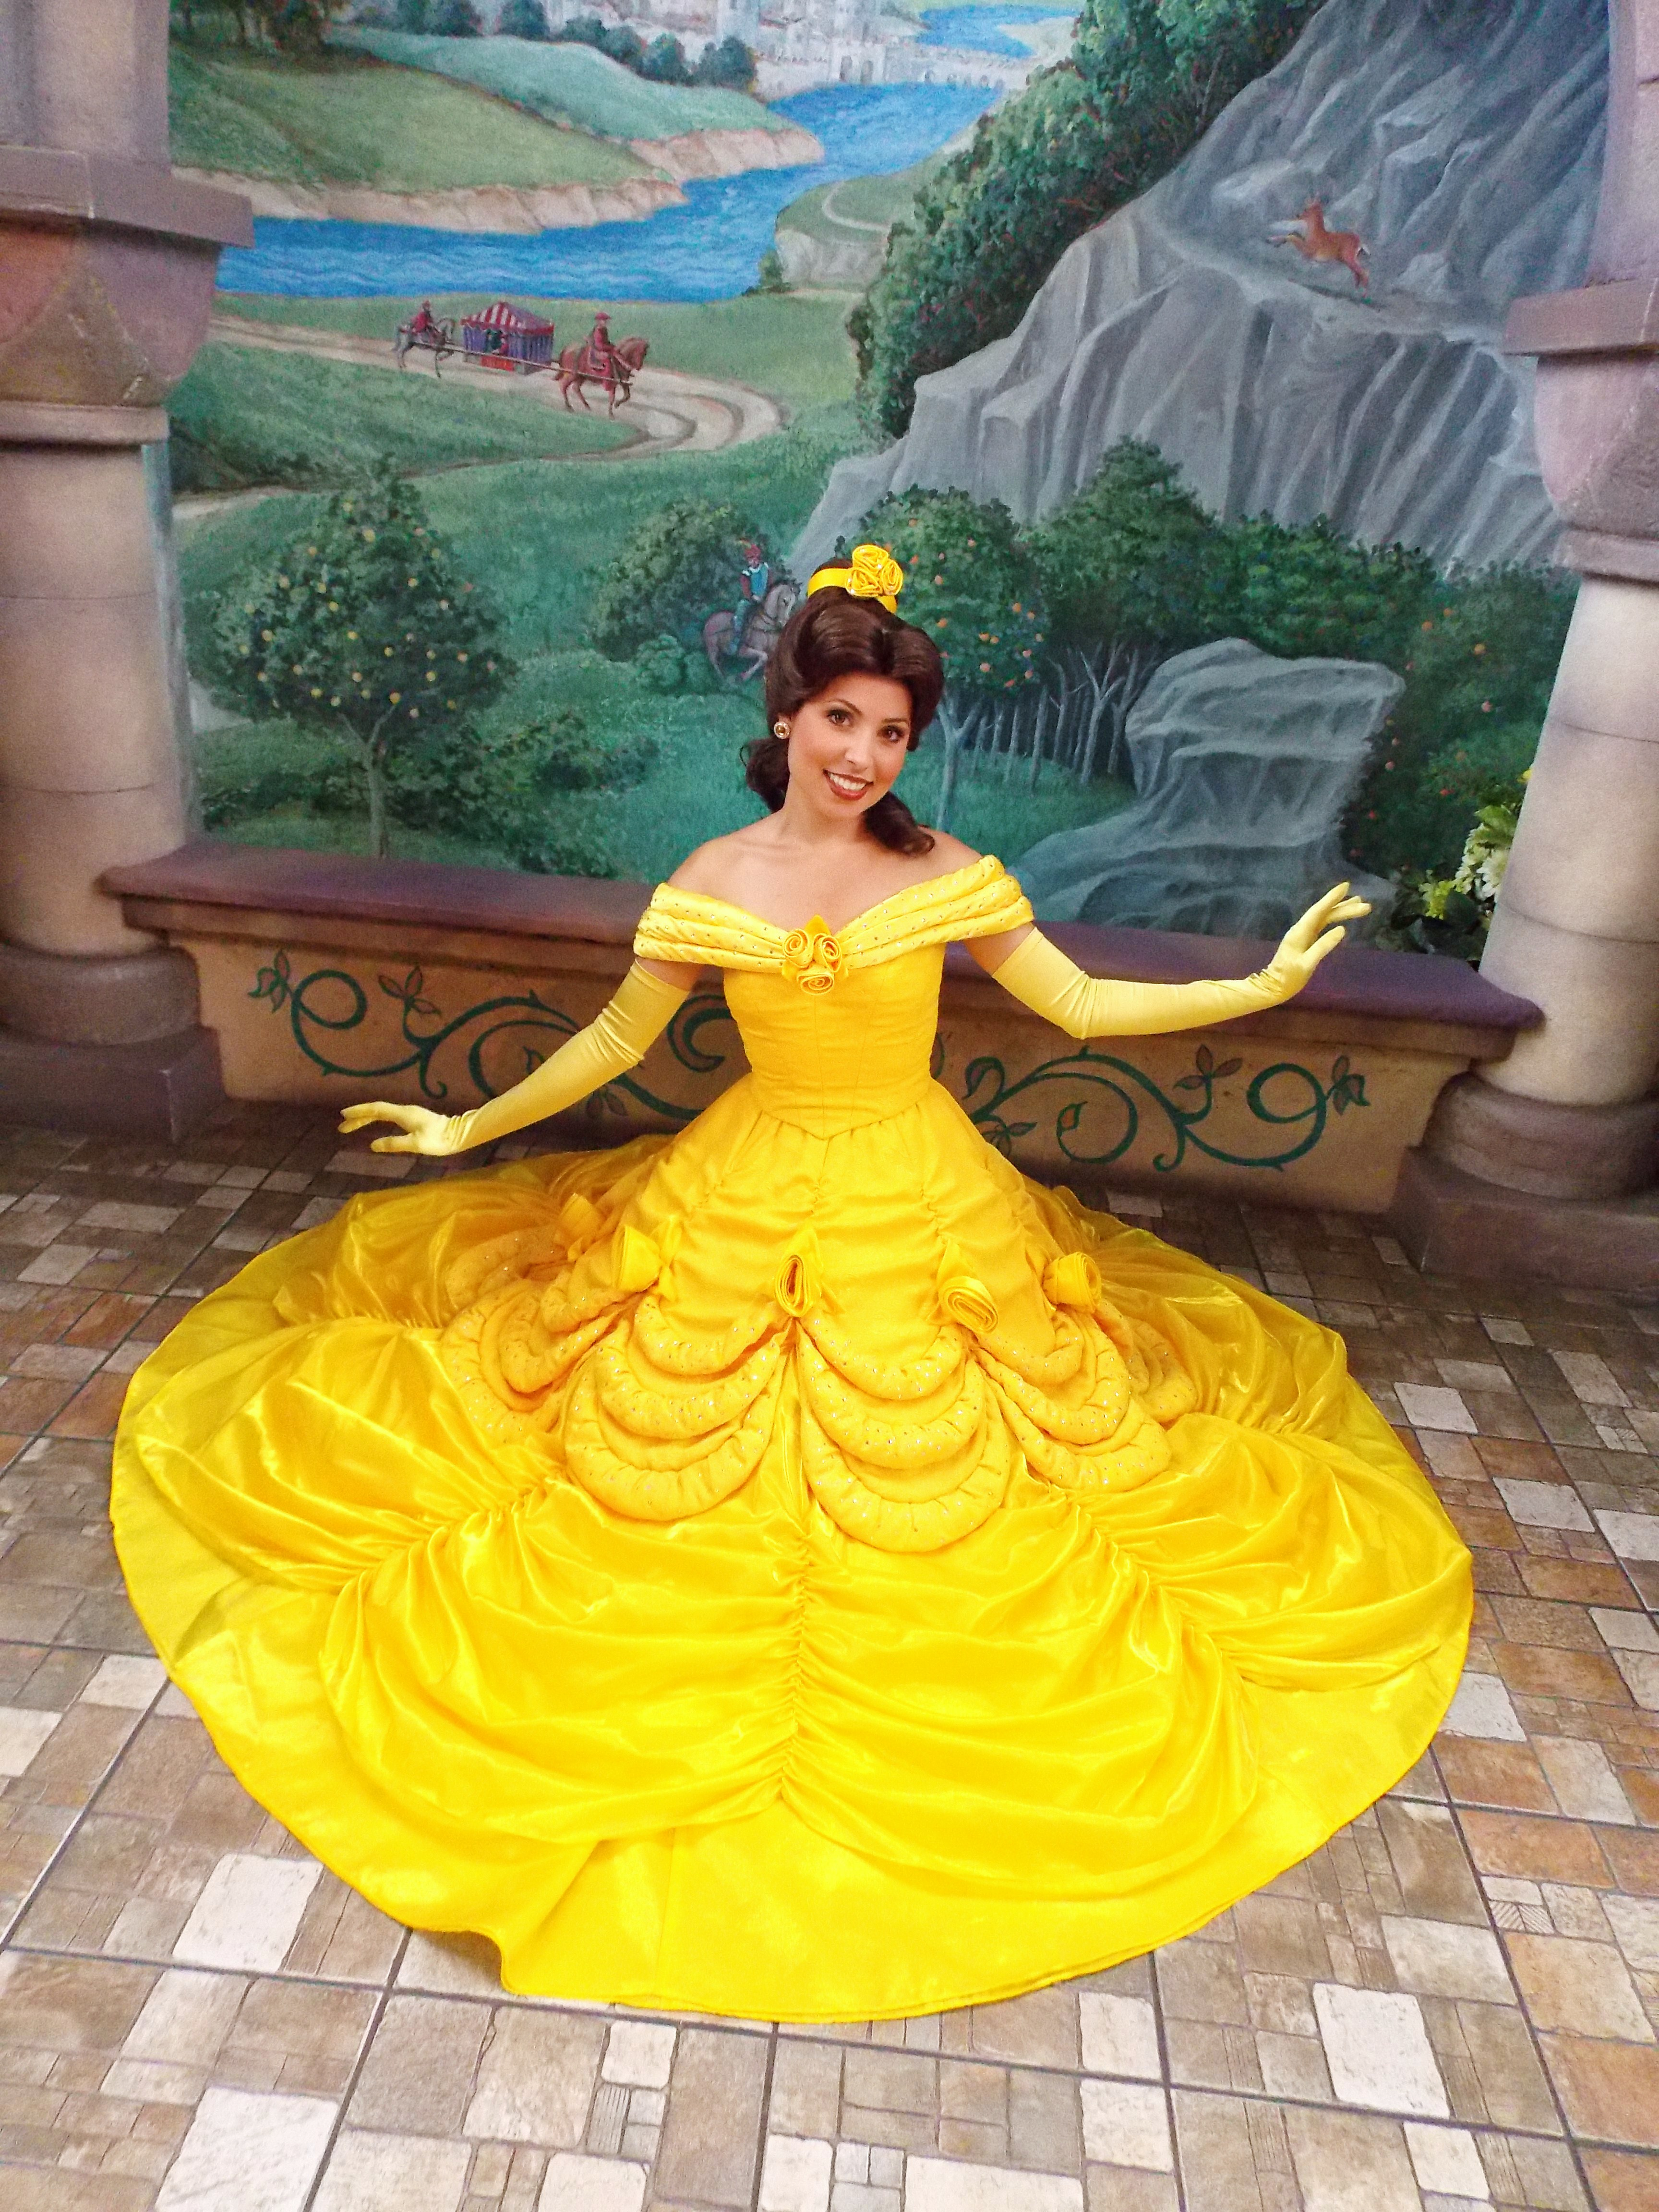 Disney Princess Belle Printable Coloring Pages